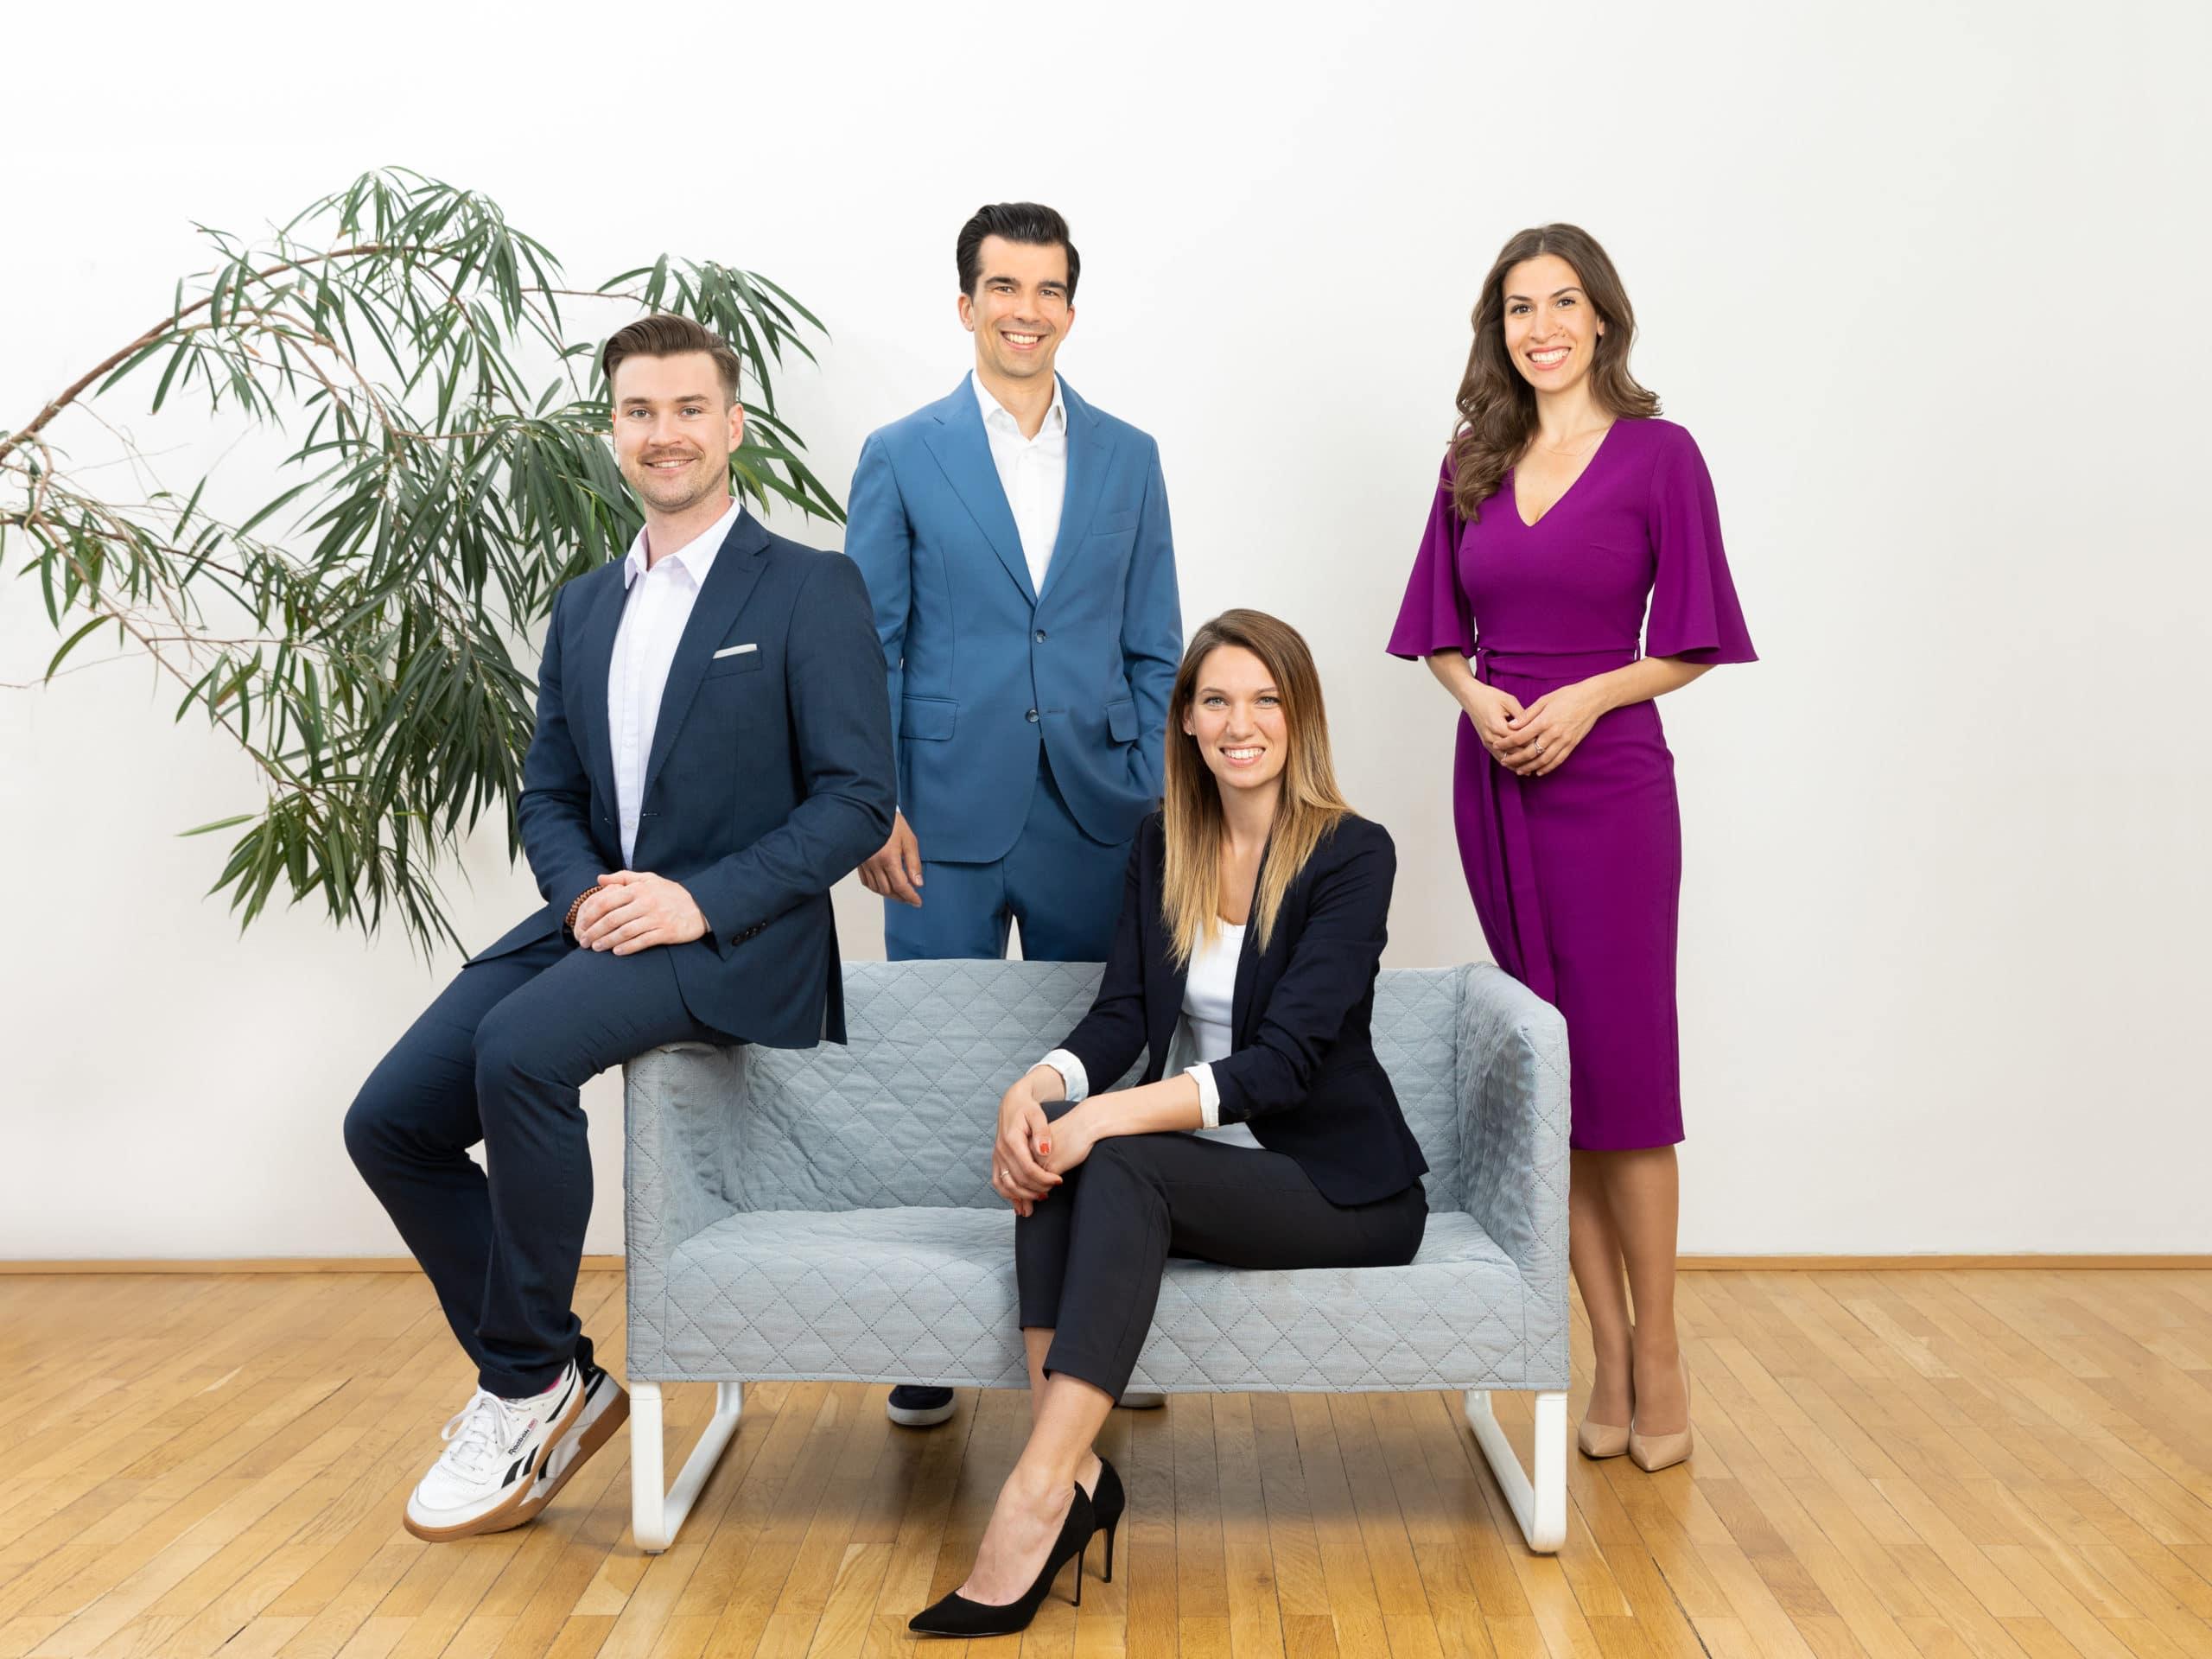 Die Neuzugänge Mirela Dayarova (Head of New Business), Katharina Hof (Head of Customer Care & Account Management) sowie David Hladik (Key Account Management)